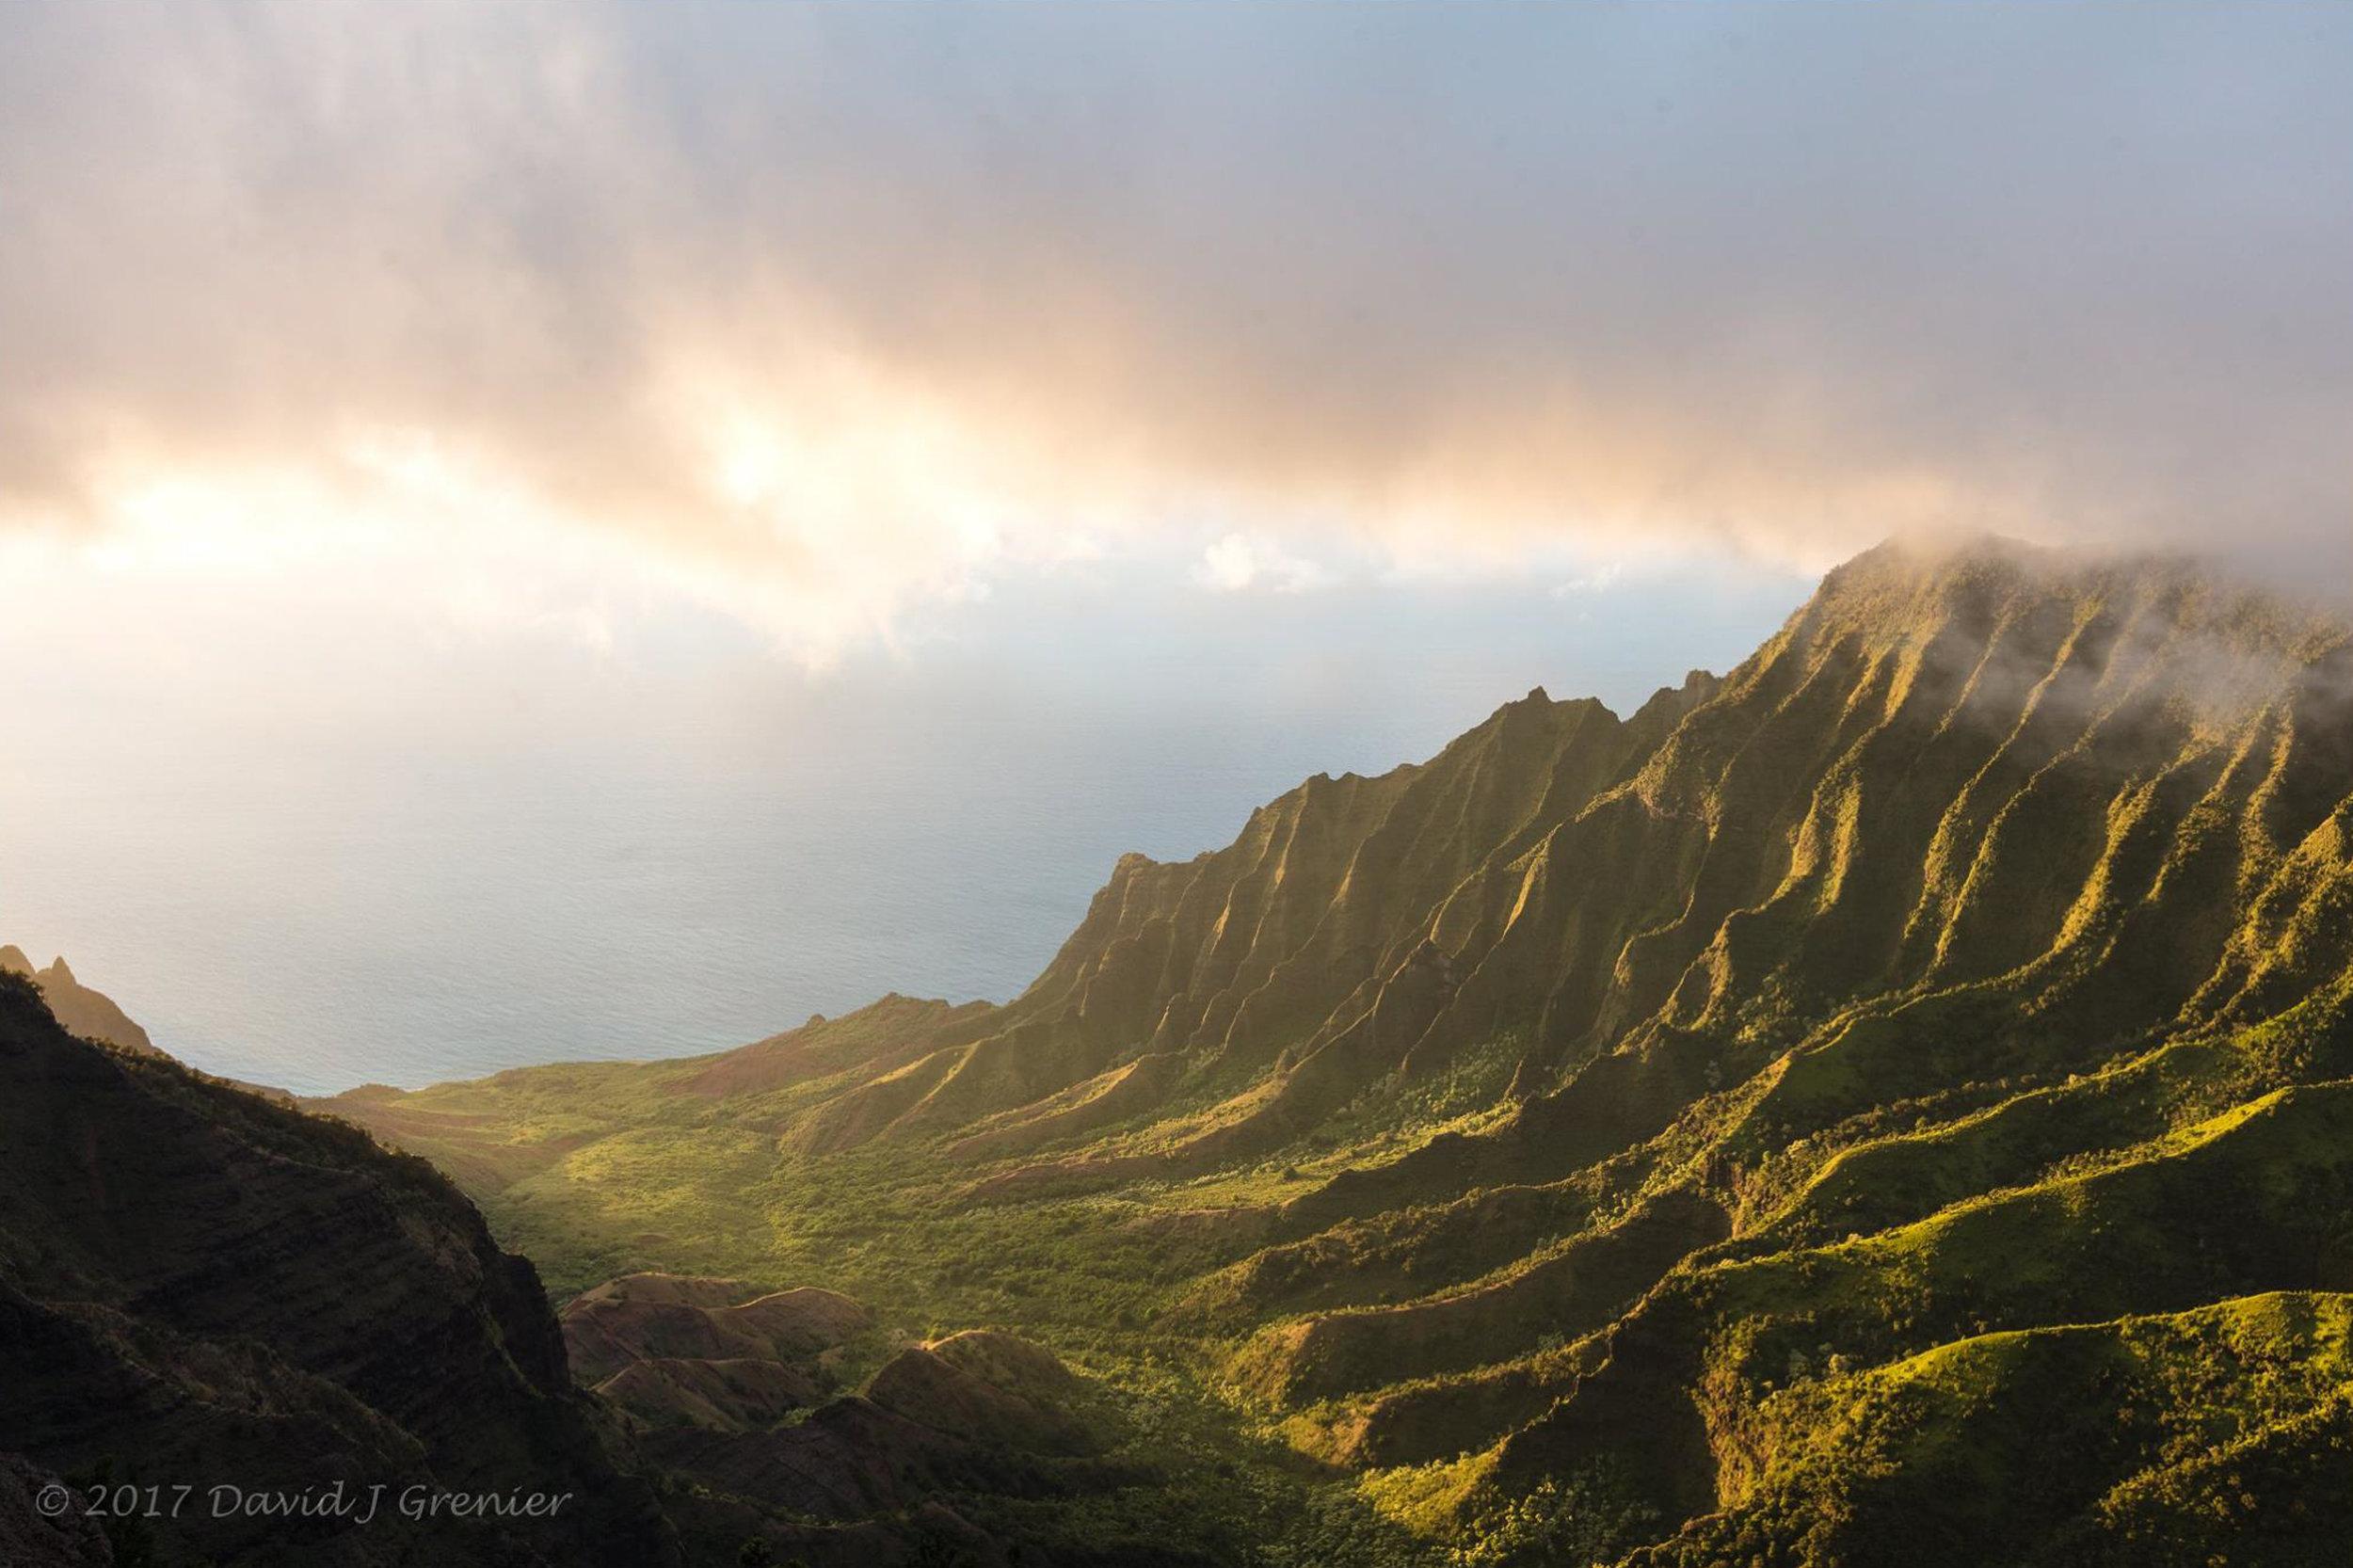 July 16, 2017, Kalalau Valley, Kauai, HI; exp. 1/6 sec @ f/11; 24-105mm lens @ 29mm; ISO 160